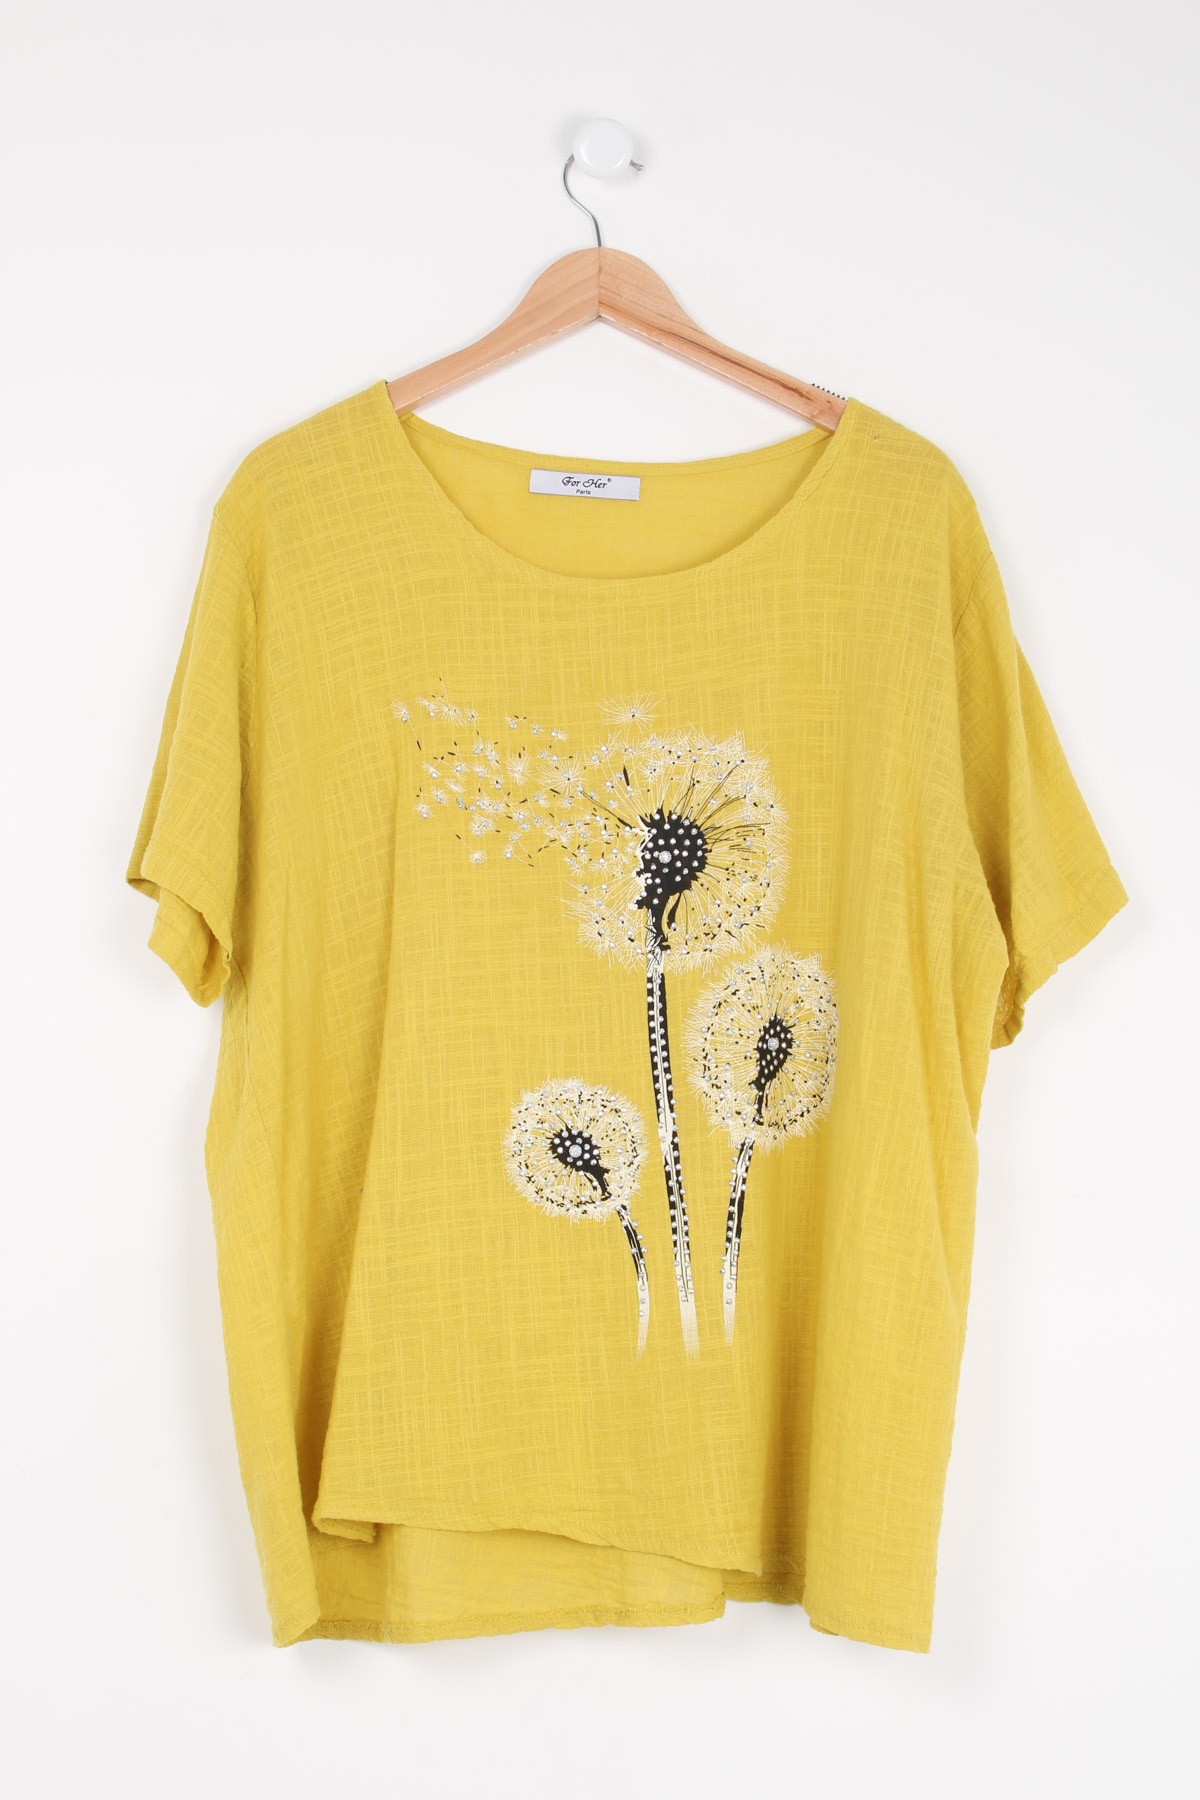 Chemises Femme Jaune For Her Paris (SHINIE) 9289 #c eFashion Paris